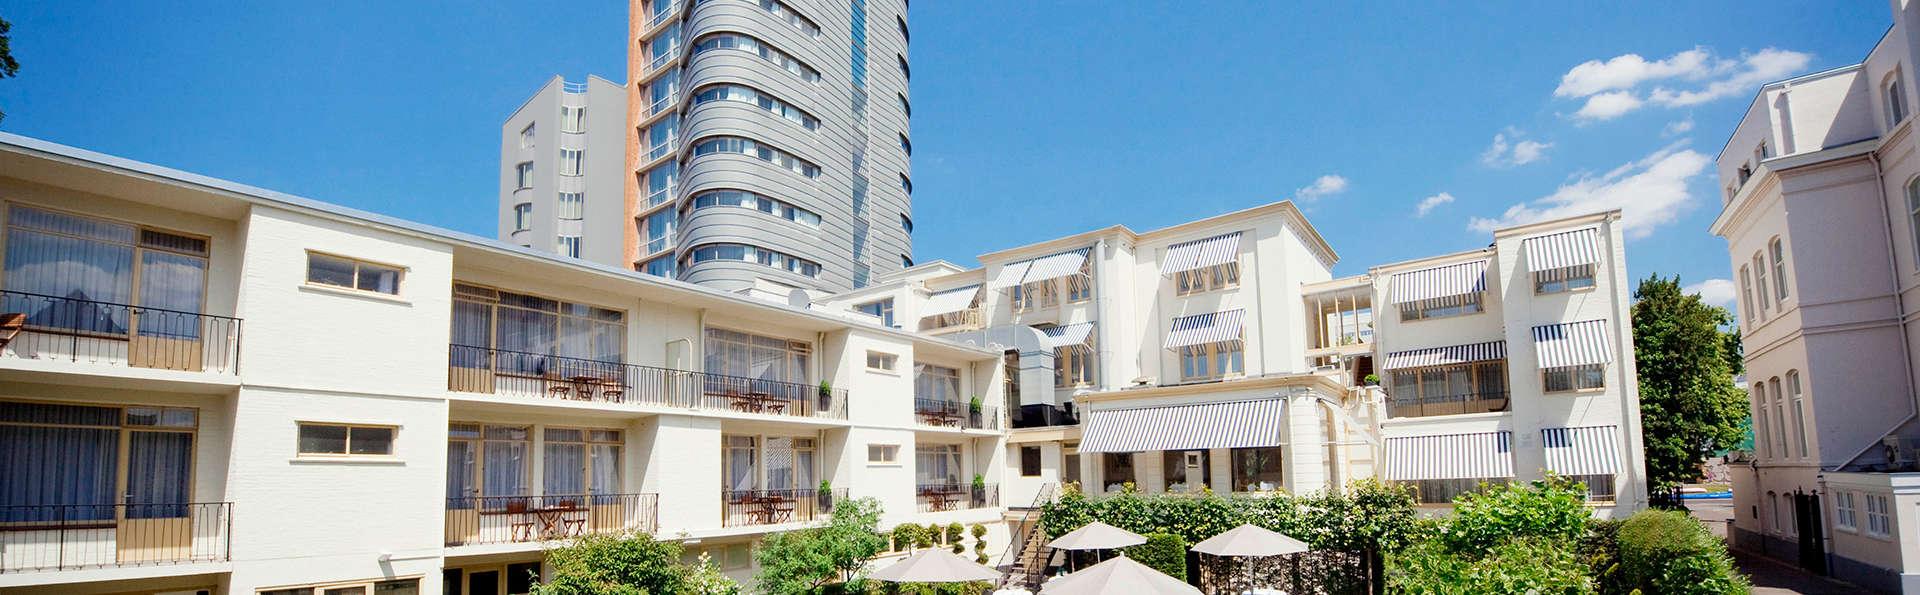 Bilderberg Parkhotel Rotterdam - EDIT_NEW_Front.jpg